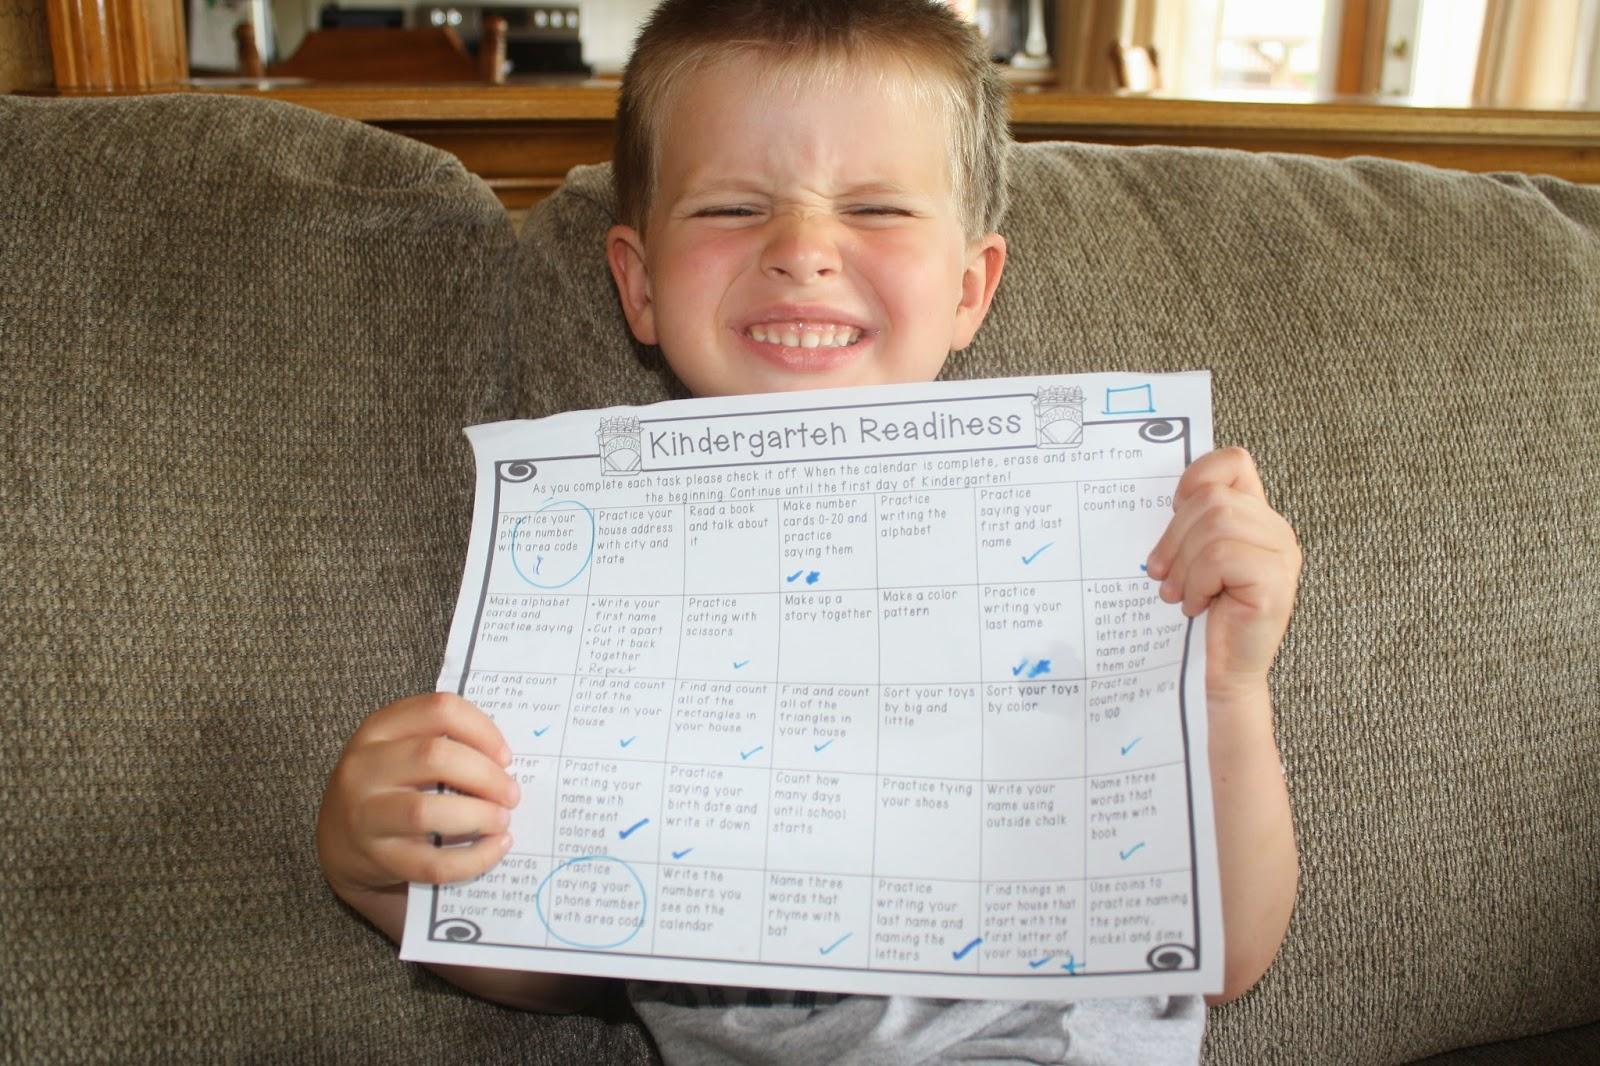 http://www.teacherspayteachers.com/Product/Kindergarten-Readiness-Skills-549006